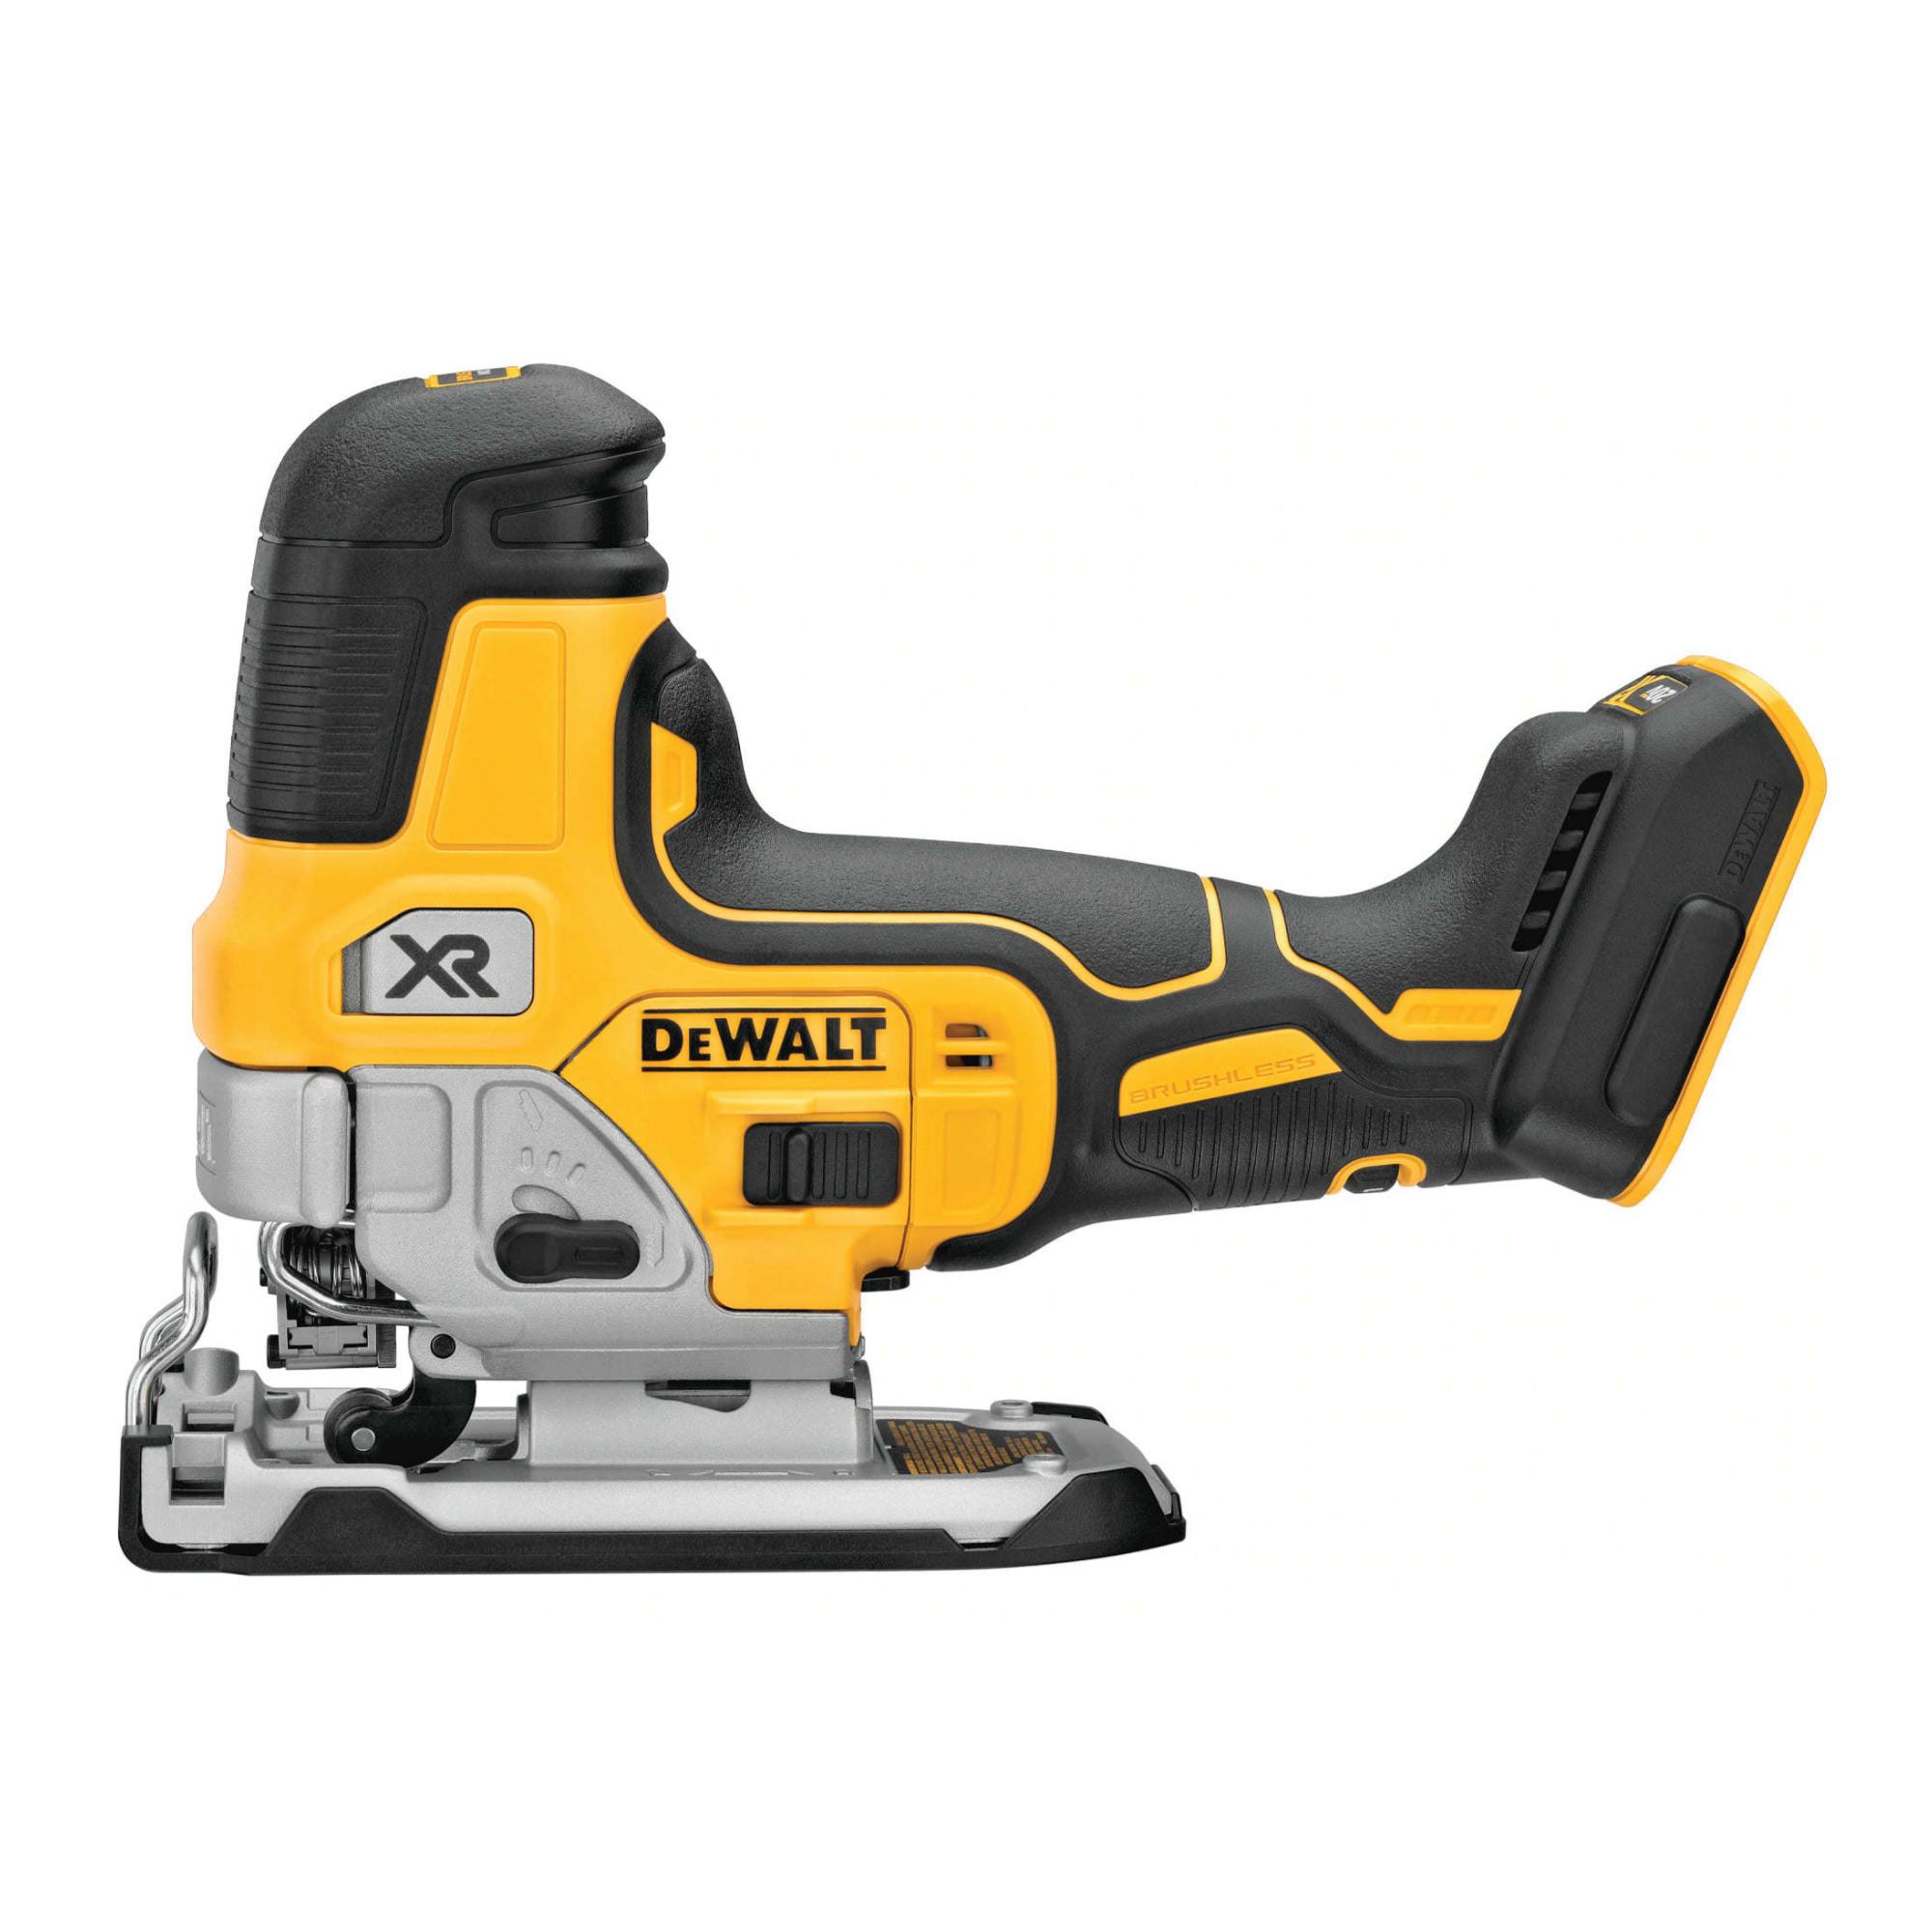 DeWalt DCS335B 20V MAX Cordless Barrel Grip Jig Saw (Tool Only) for $145 + Free Shipping